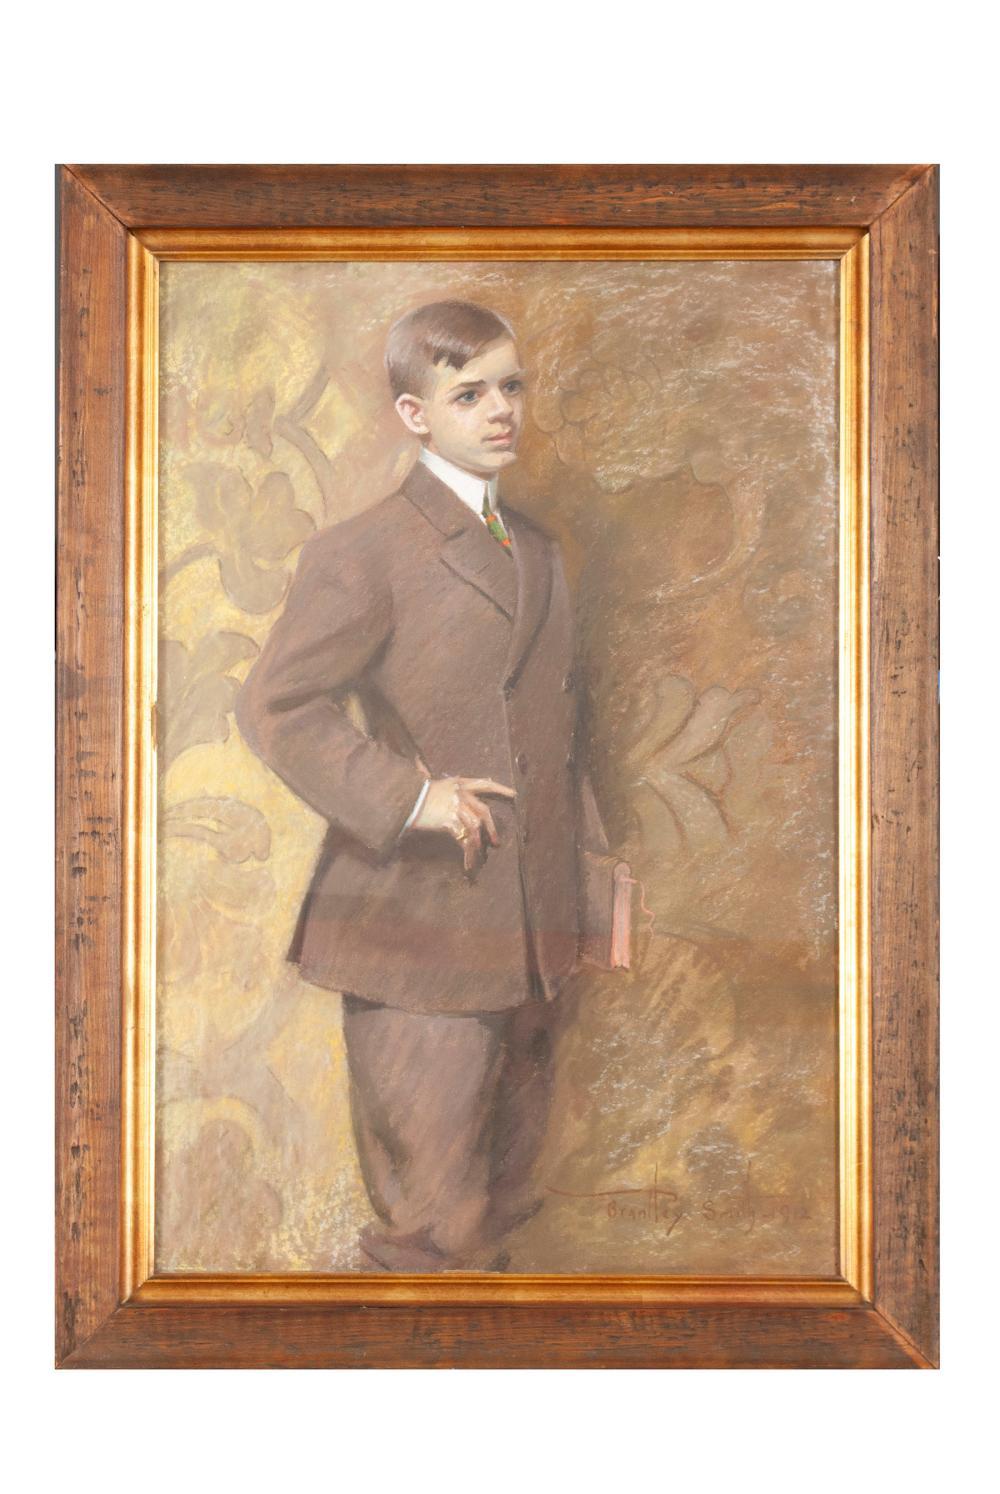 PORTRAIT OF GEORGE WILLARD COBB BY BRANTLEY SMITH (AMERICAN, 19TH/20TH CENTURY)